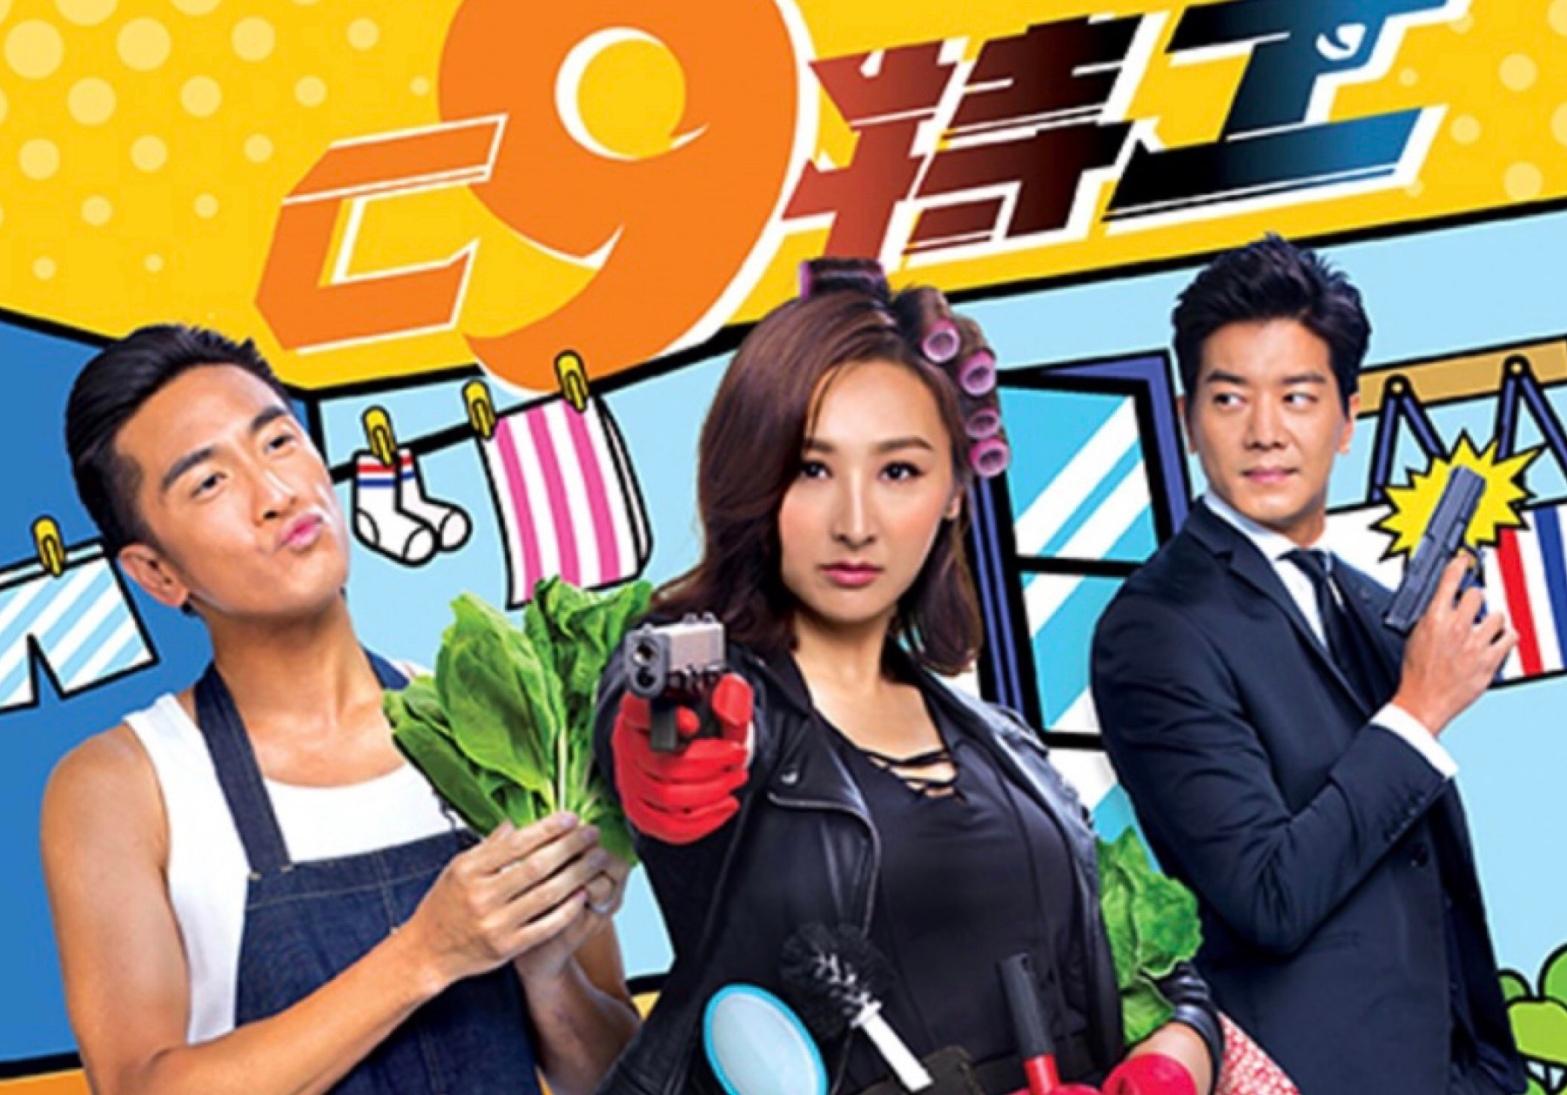 Agent C9 TVB drama poster